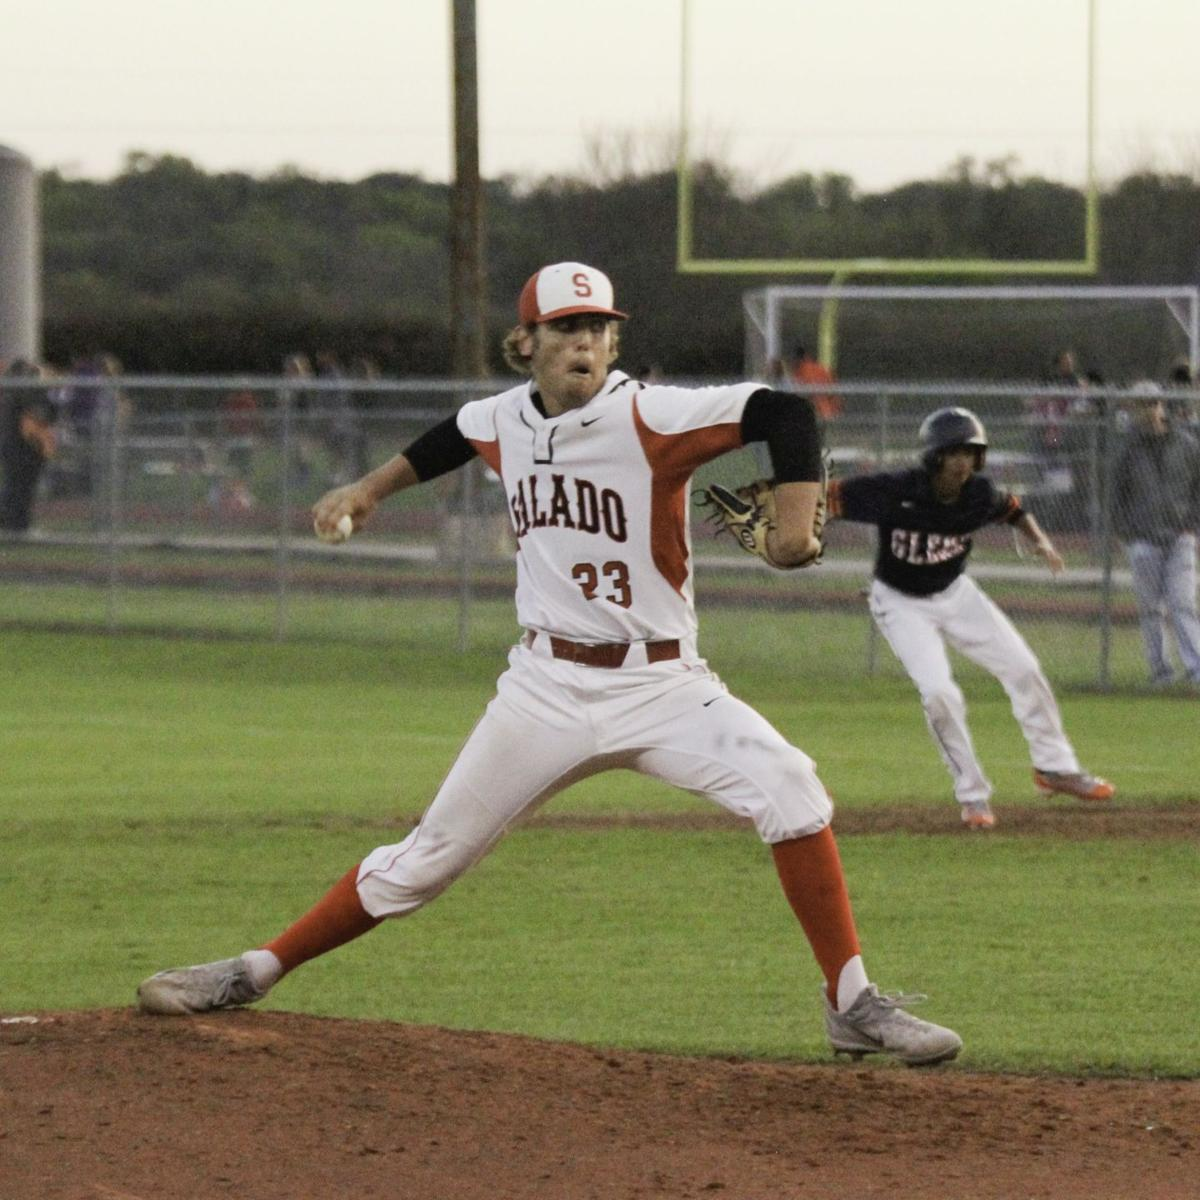 Leander Glenn-Salado baseball